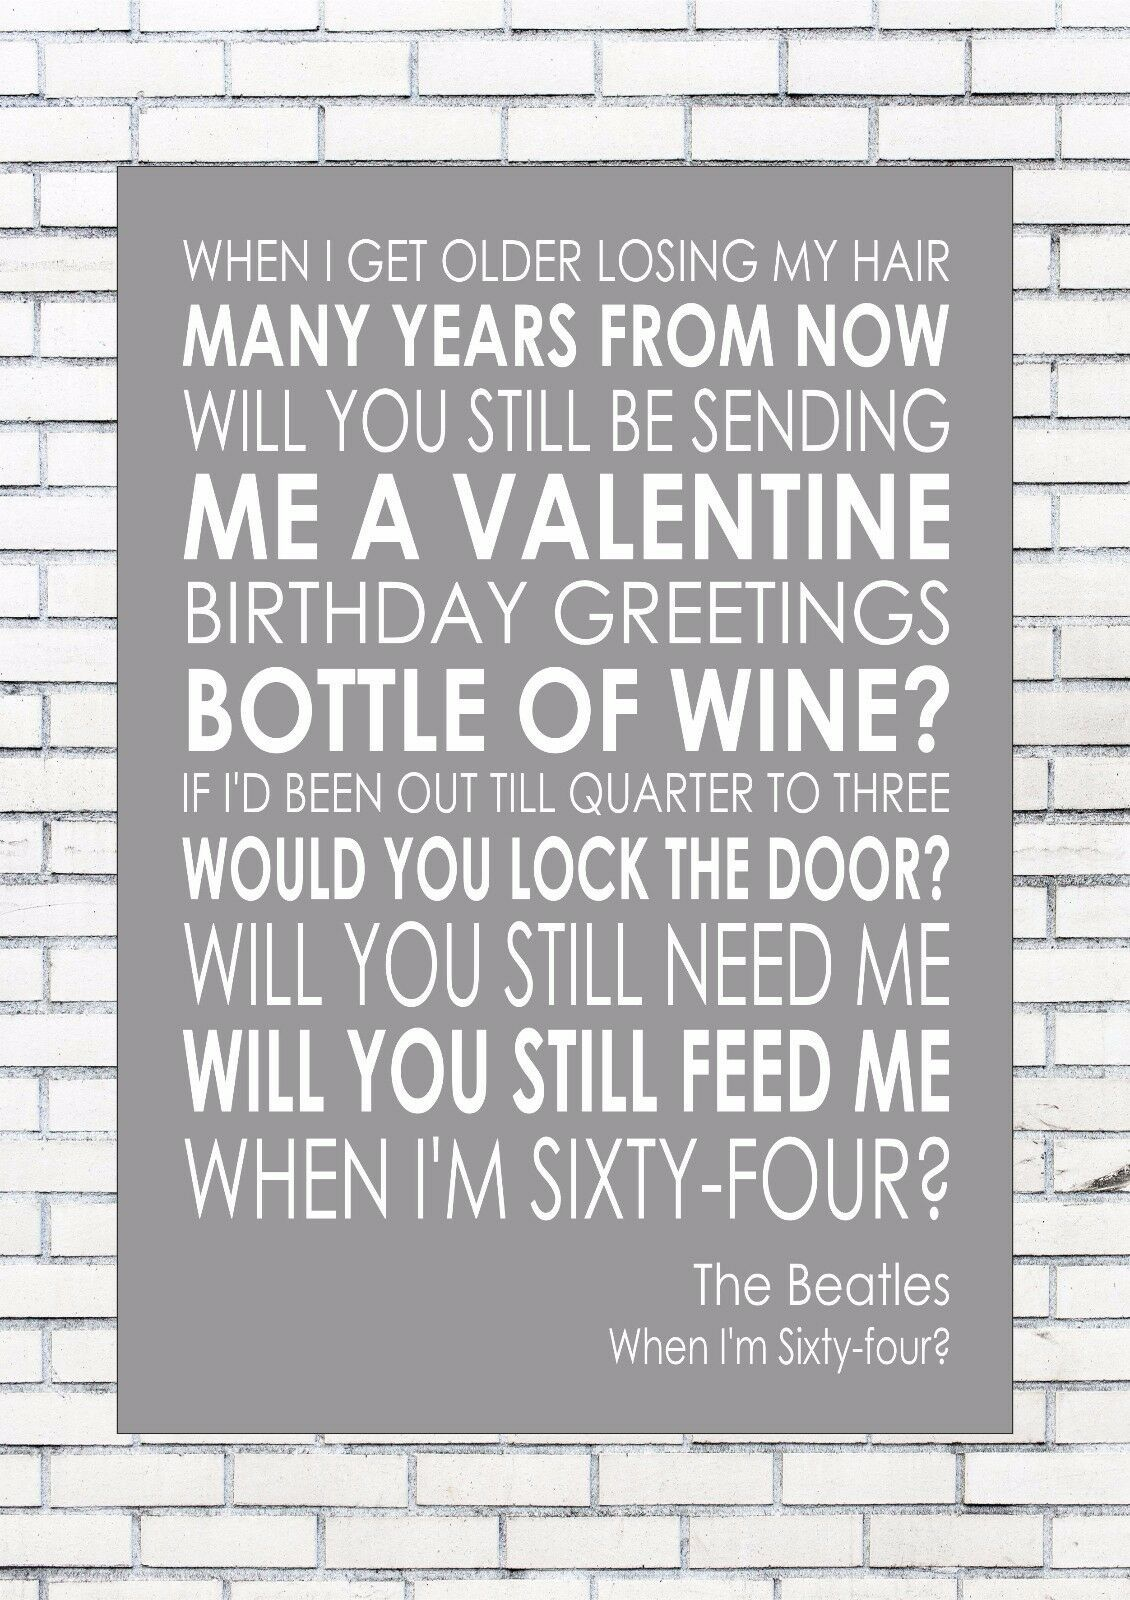 Details About When I M 64 Sixty Four The Beatles Word Wall Art Words Print Canvas Lyric Lyrics Lyrics On Canvas Words Prints The Beatles